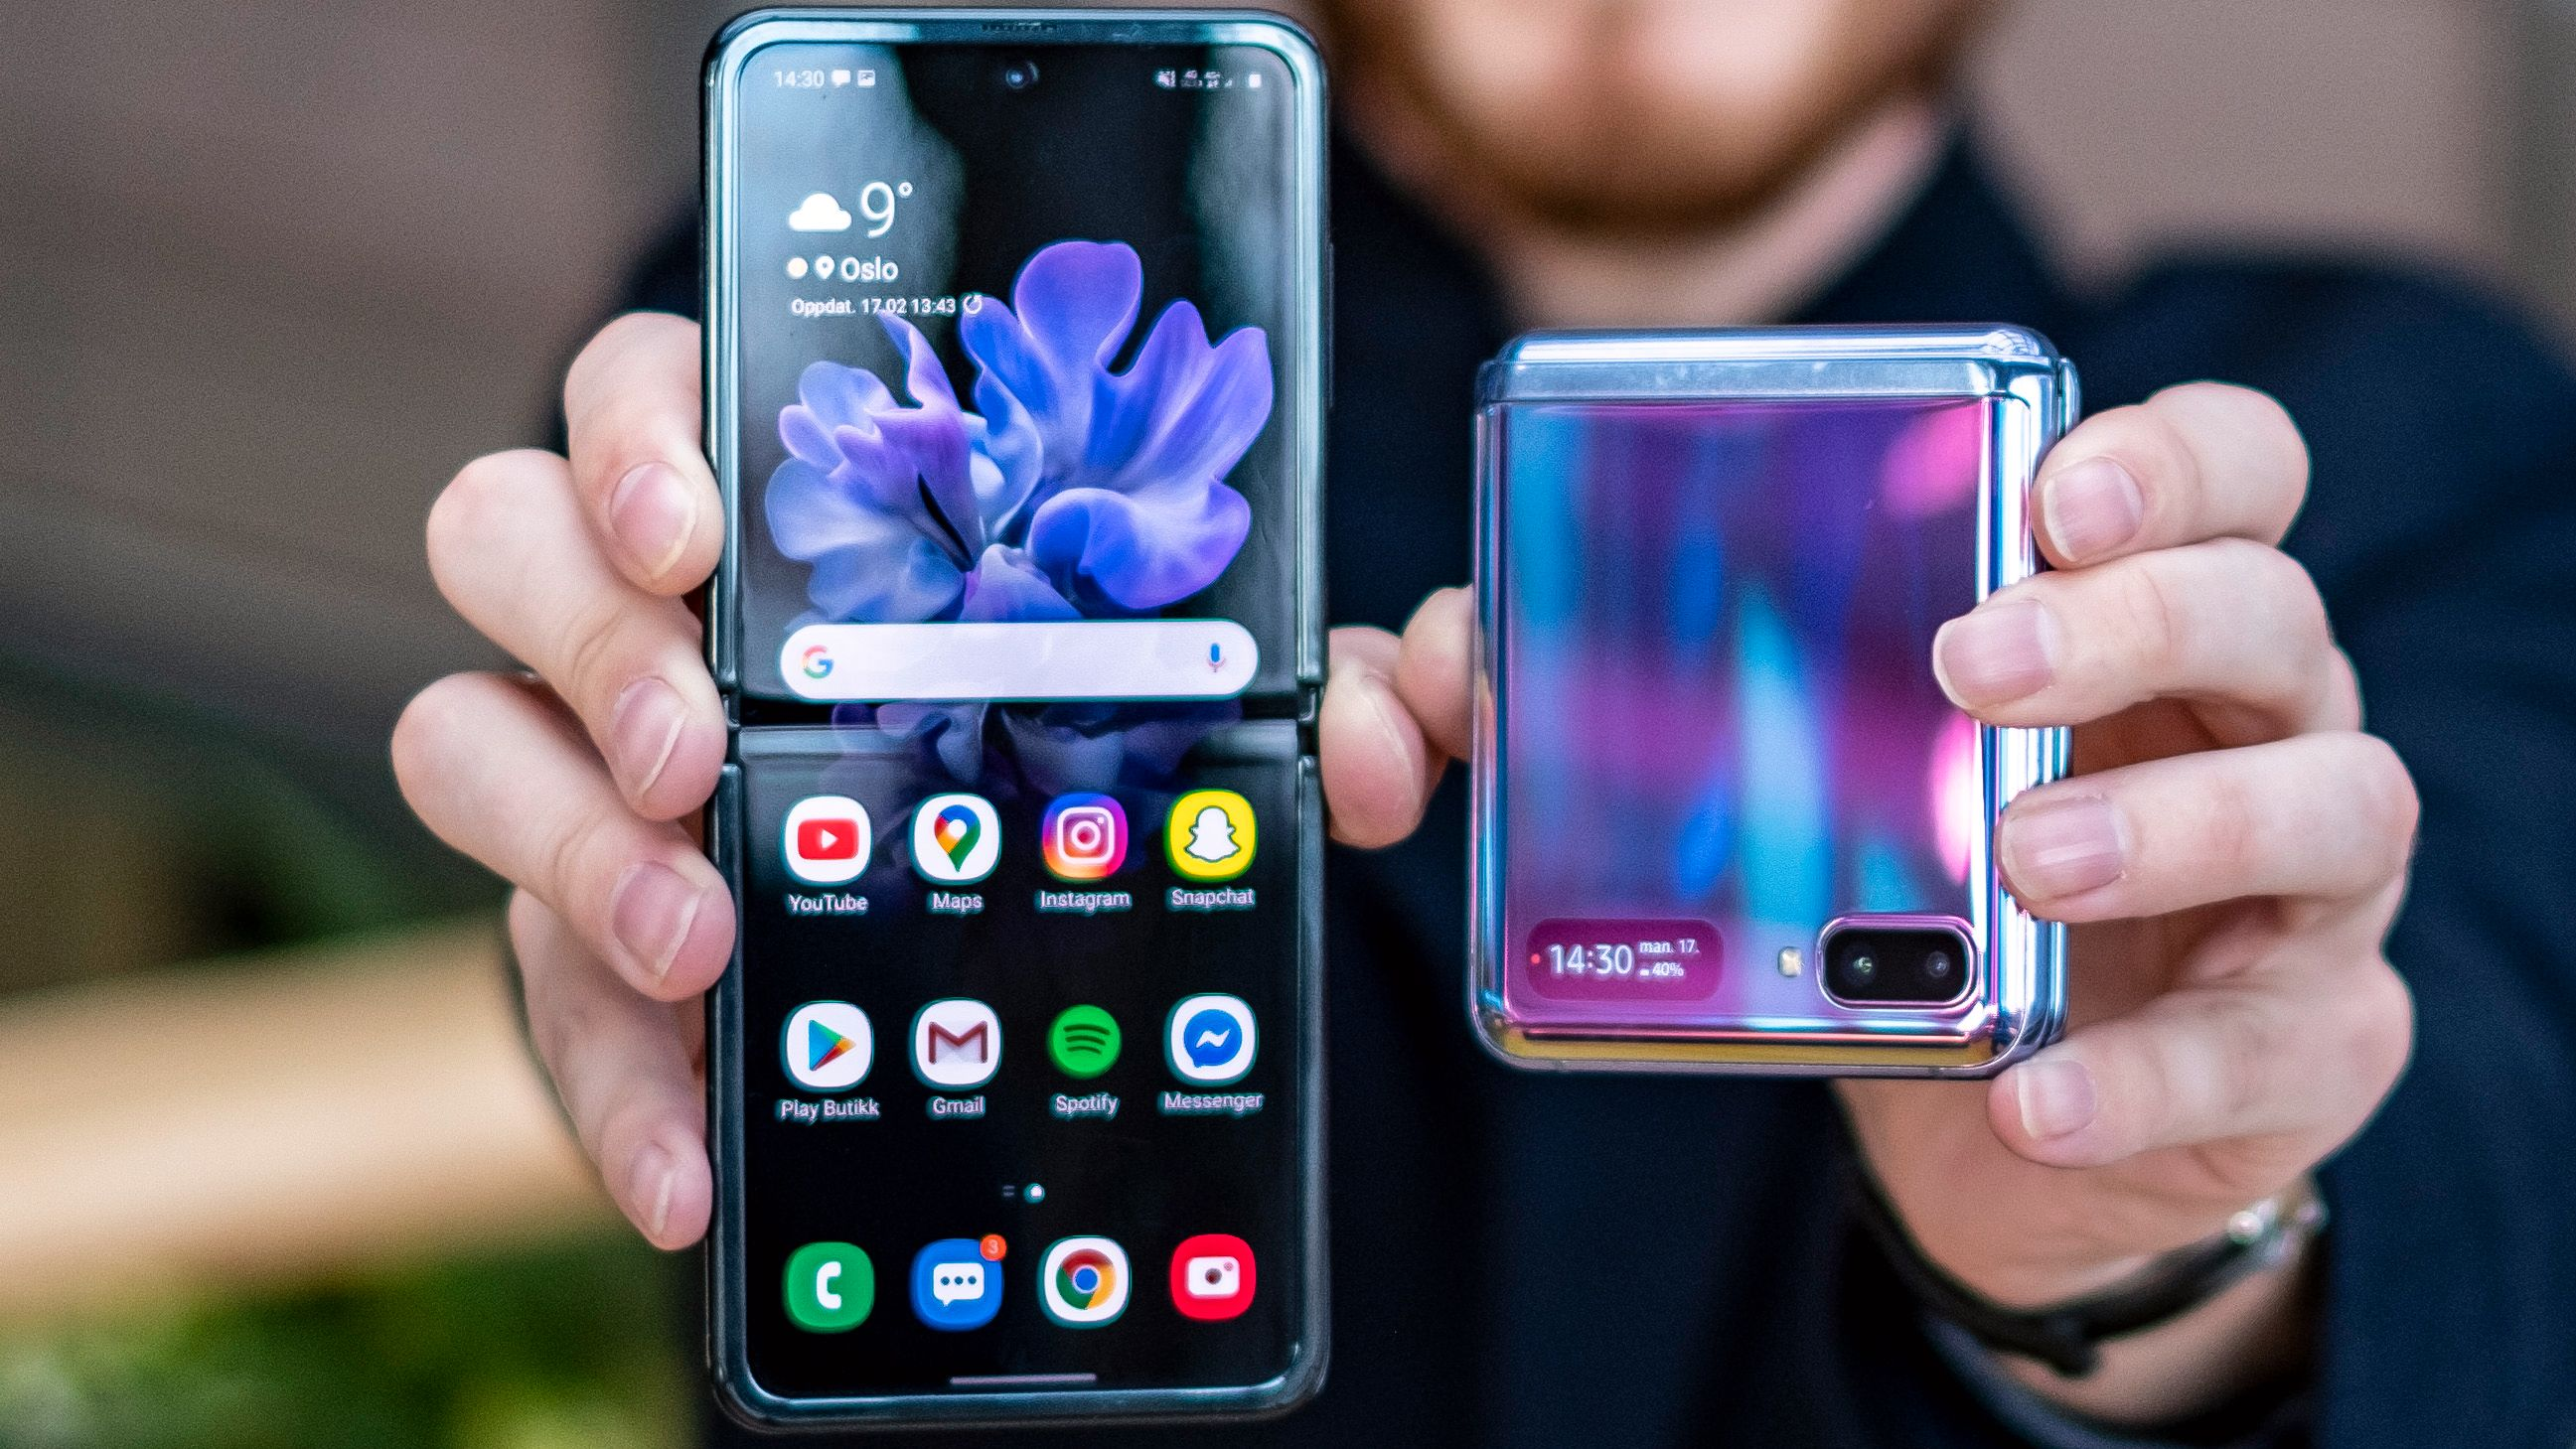 Endelig har Samsung funnet formen